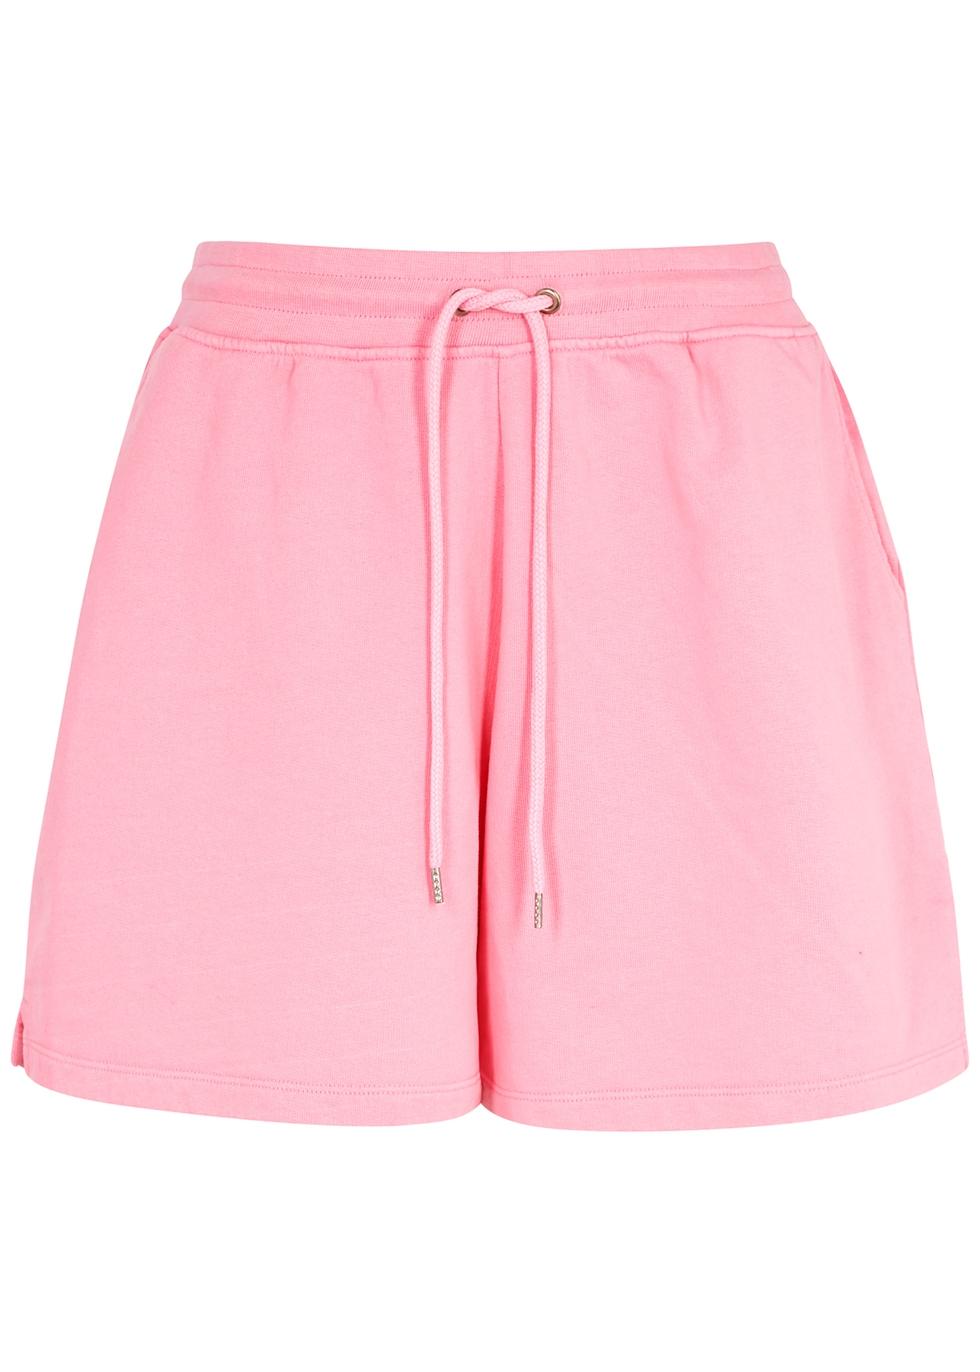 Light pink cotton shorts